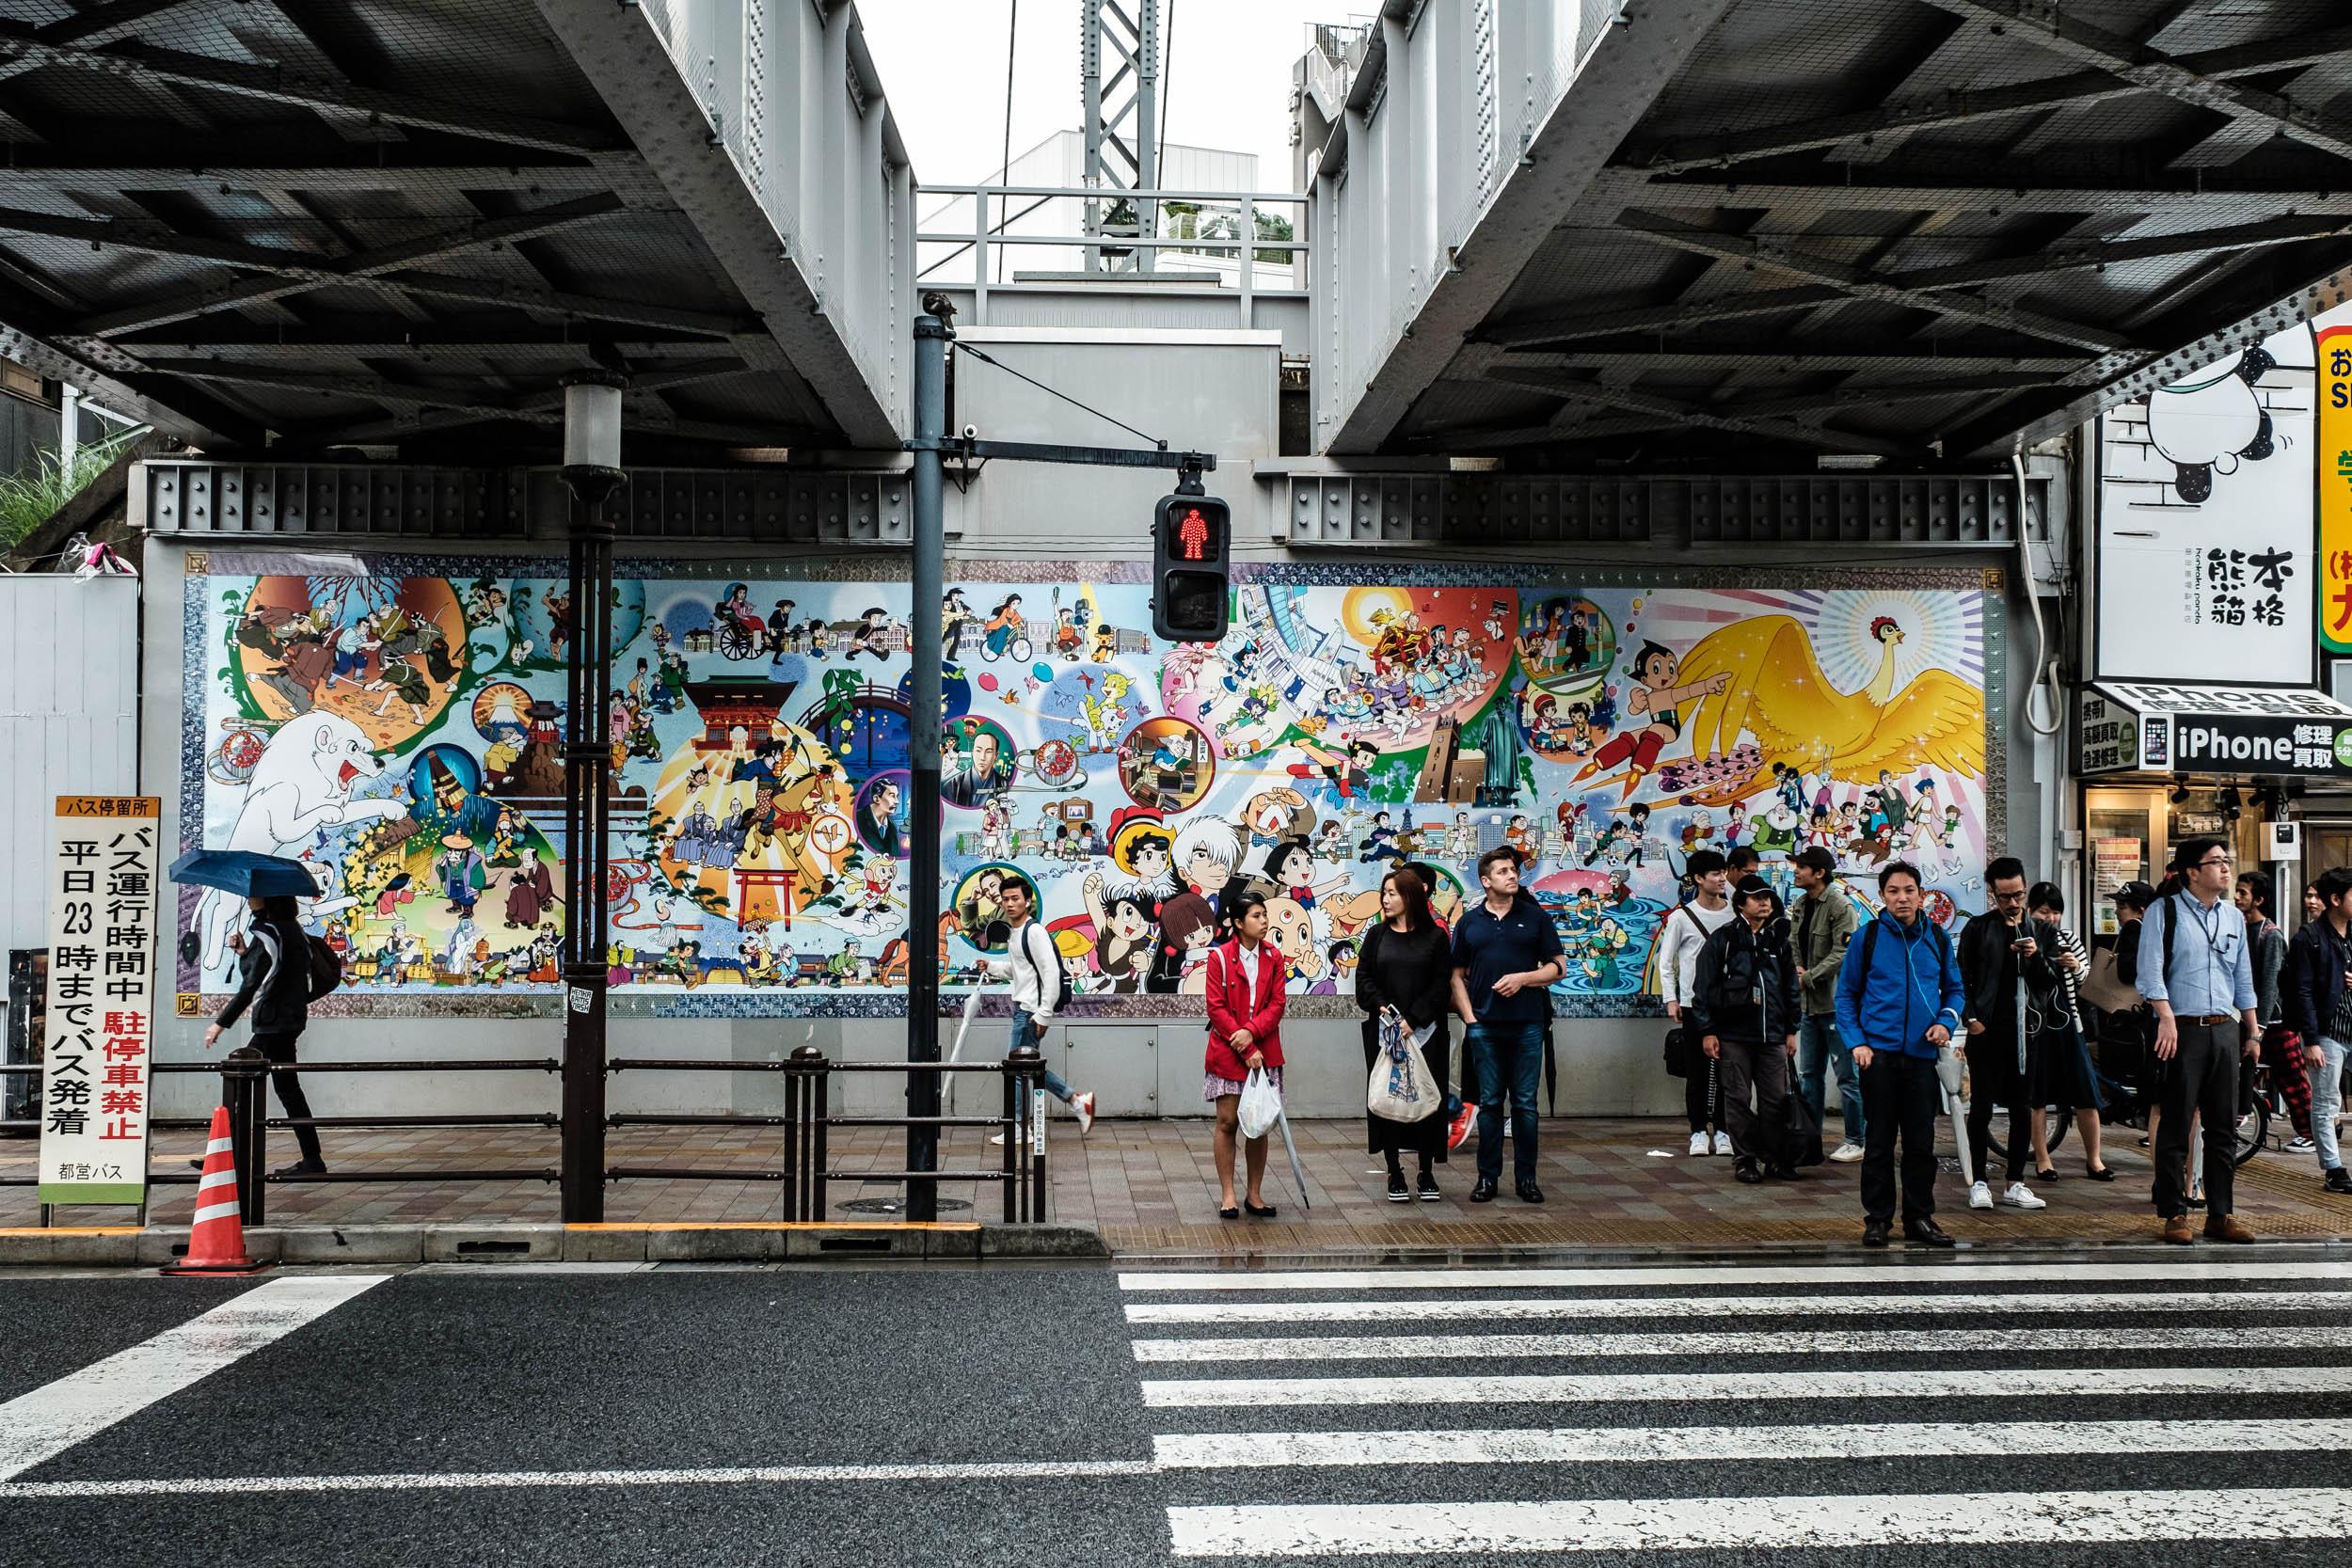 The smaller mural under the Seibu Ikebukuro tracks